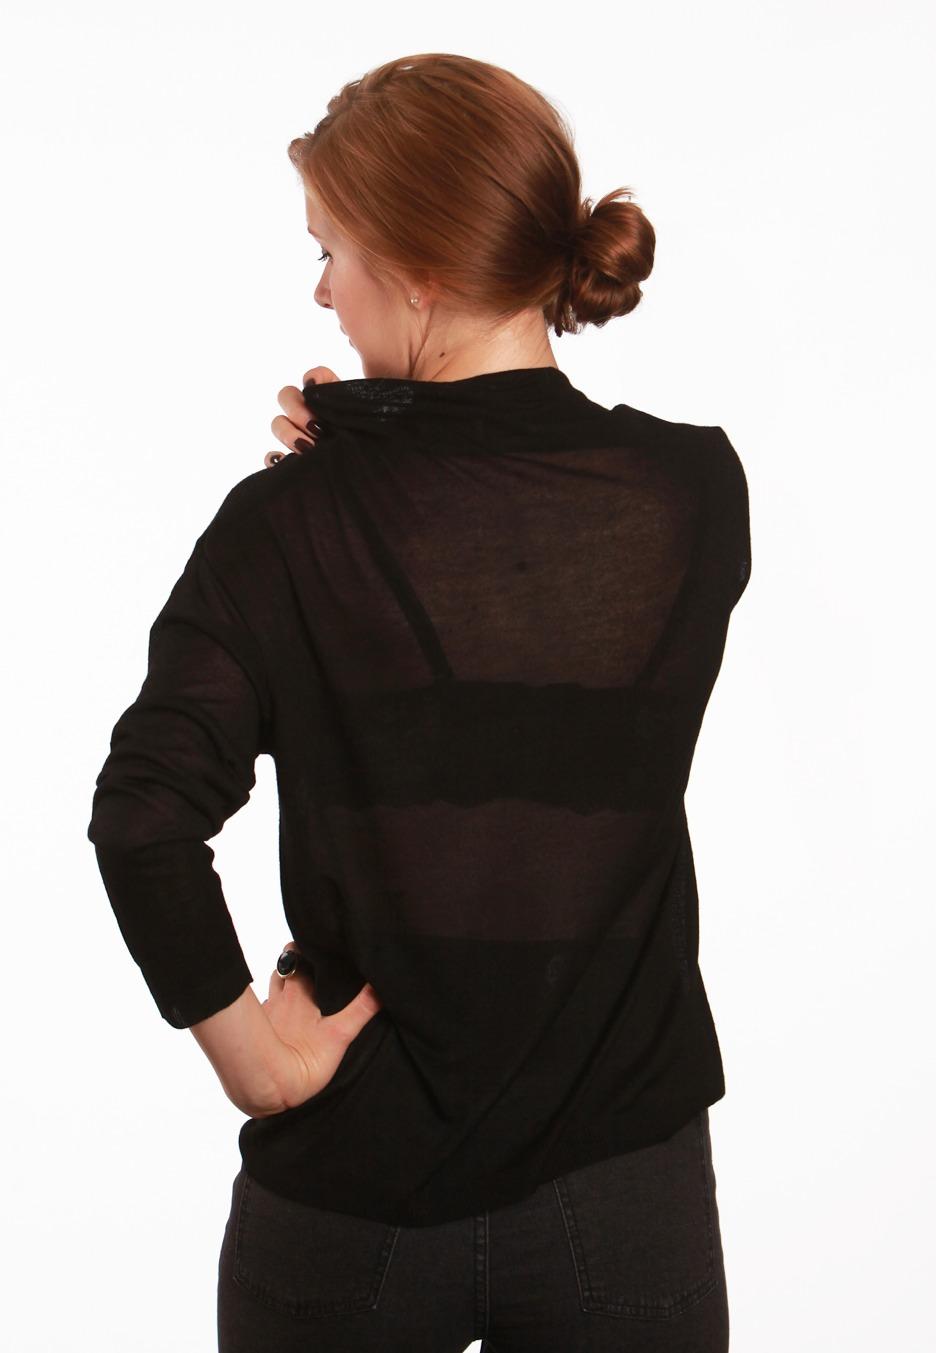 Cheap Monday - Chaztity - Sweater de Mulher - Impericon.com PT a6927e9e4